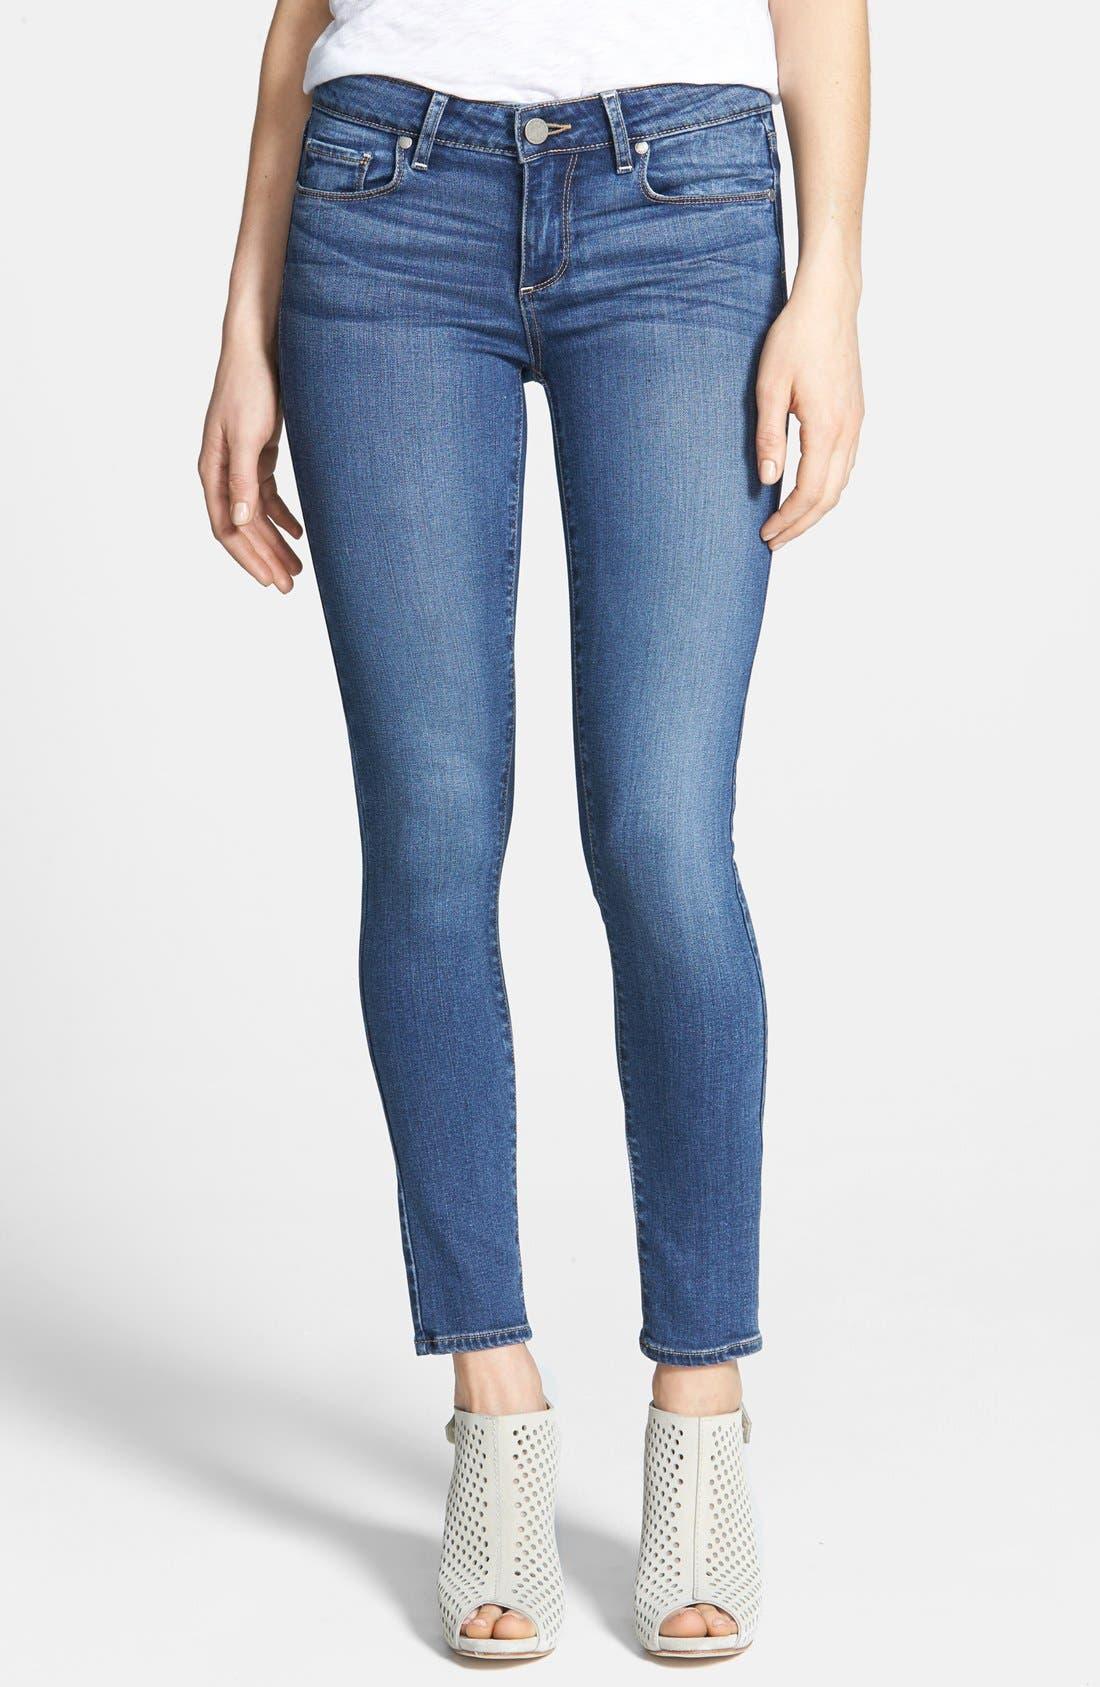 Transcend - Verdugo Ankle Skinny Jeans,                             Main thumbnail 1, color,                             TRISTAN